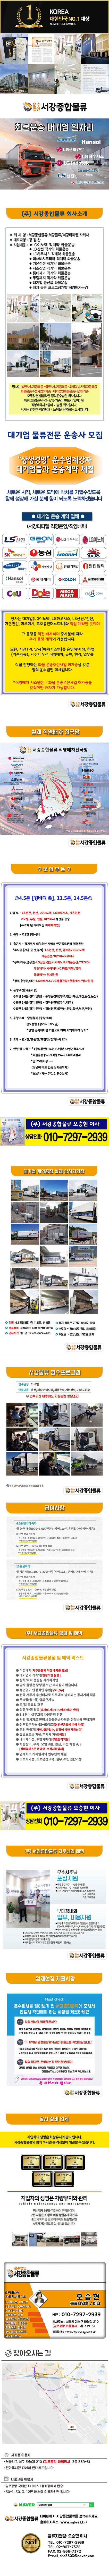 20210128_seokang.jpg